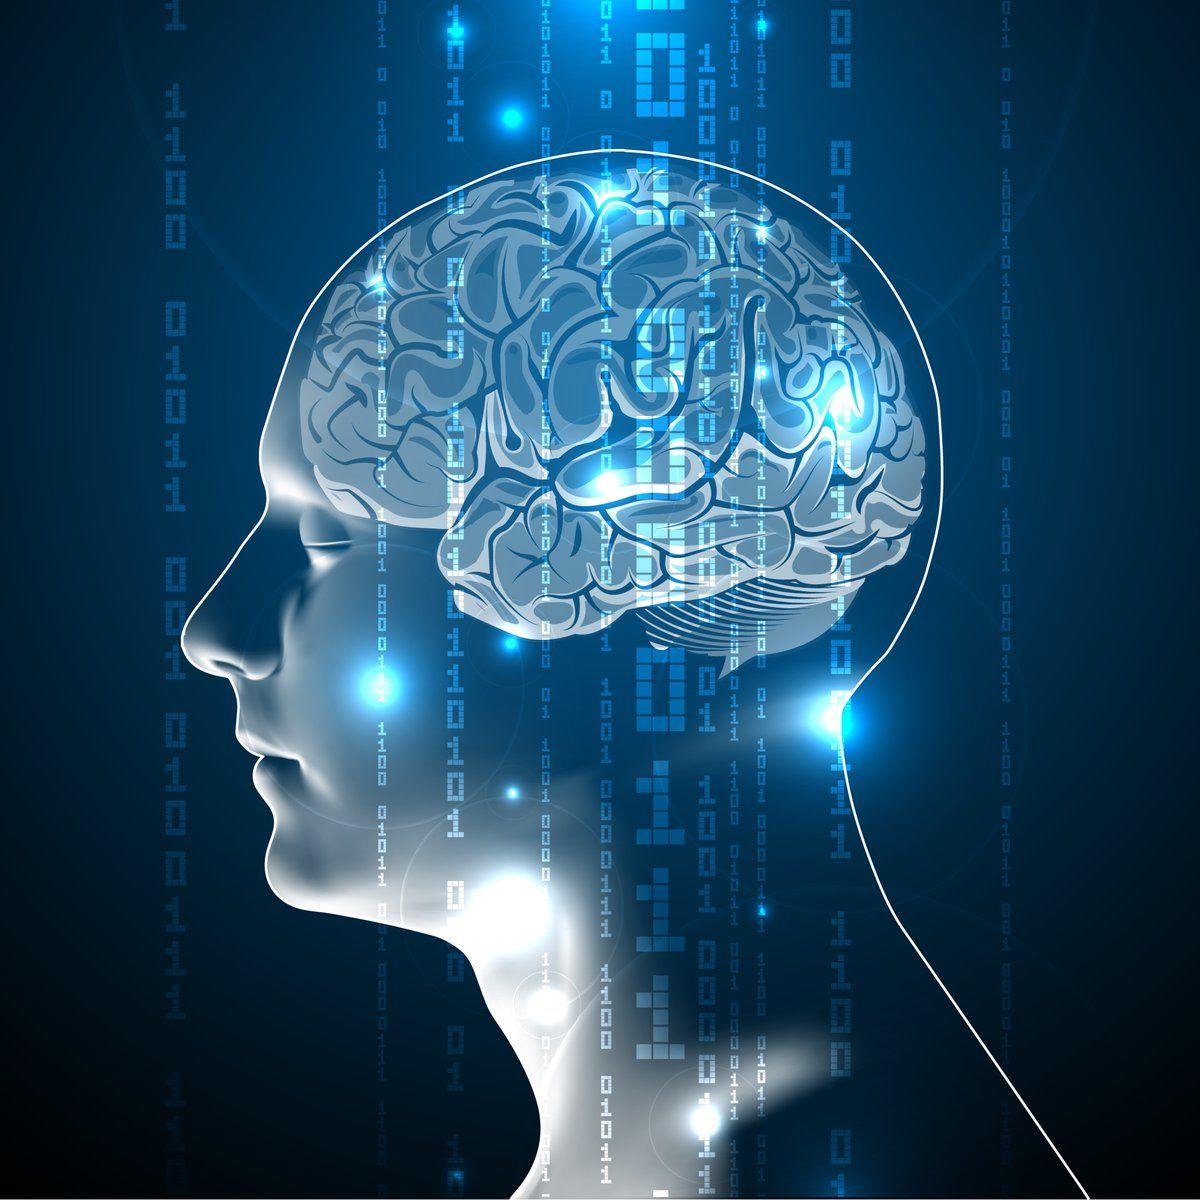 Artificial intelligence: Three common misconceptions #AI #MachineLearning #bigdata #ML #robotics #tech   http:// buff.ly/2ukCTUz  &nbsp;  <br>http://pic.twitter.com/8dCS3kOQy9